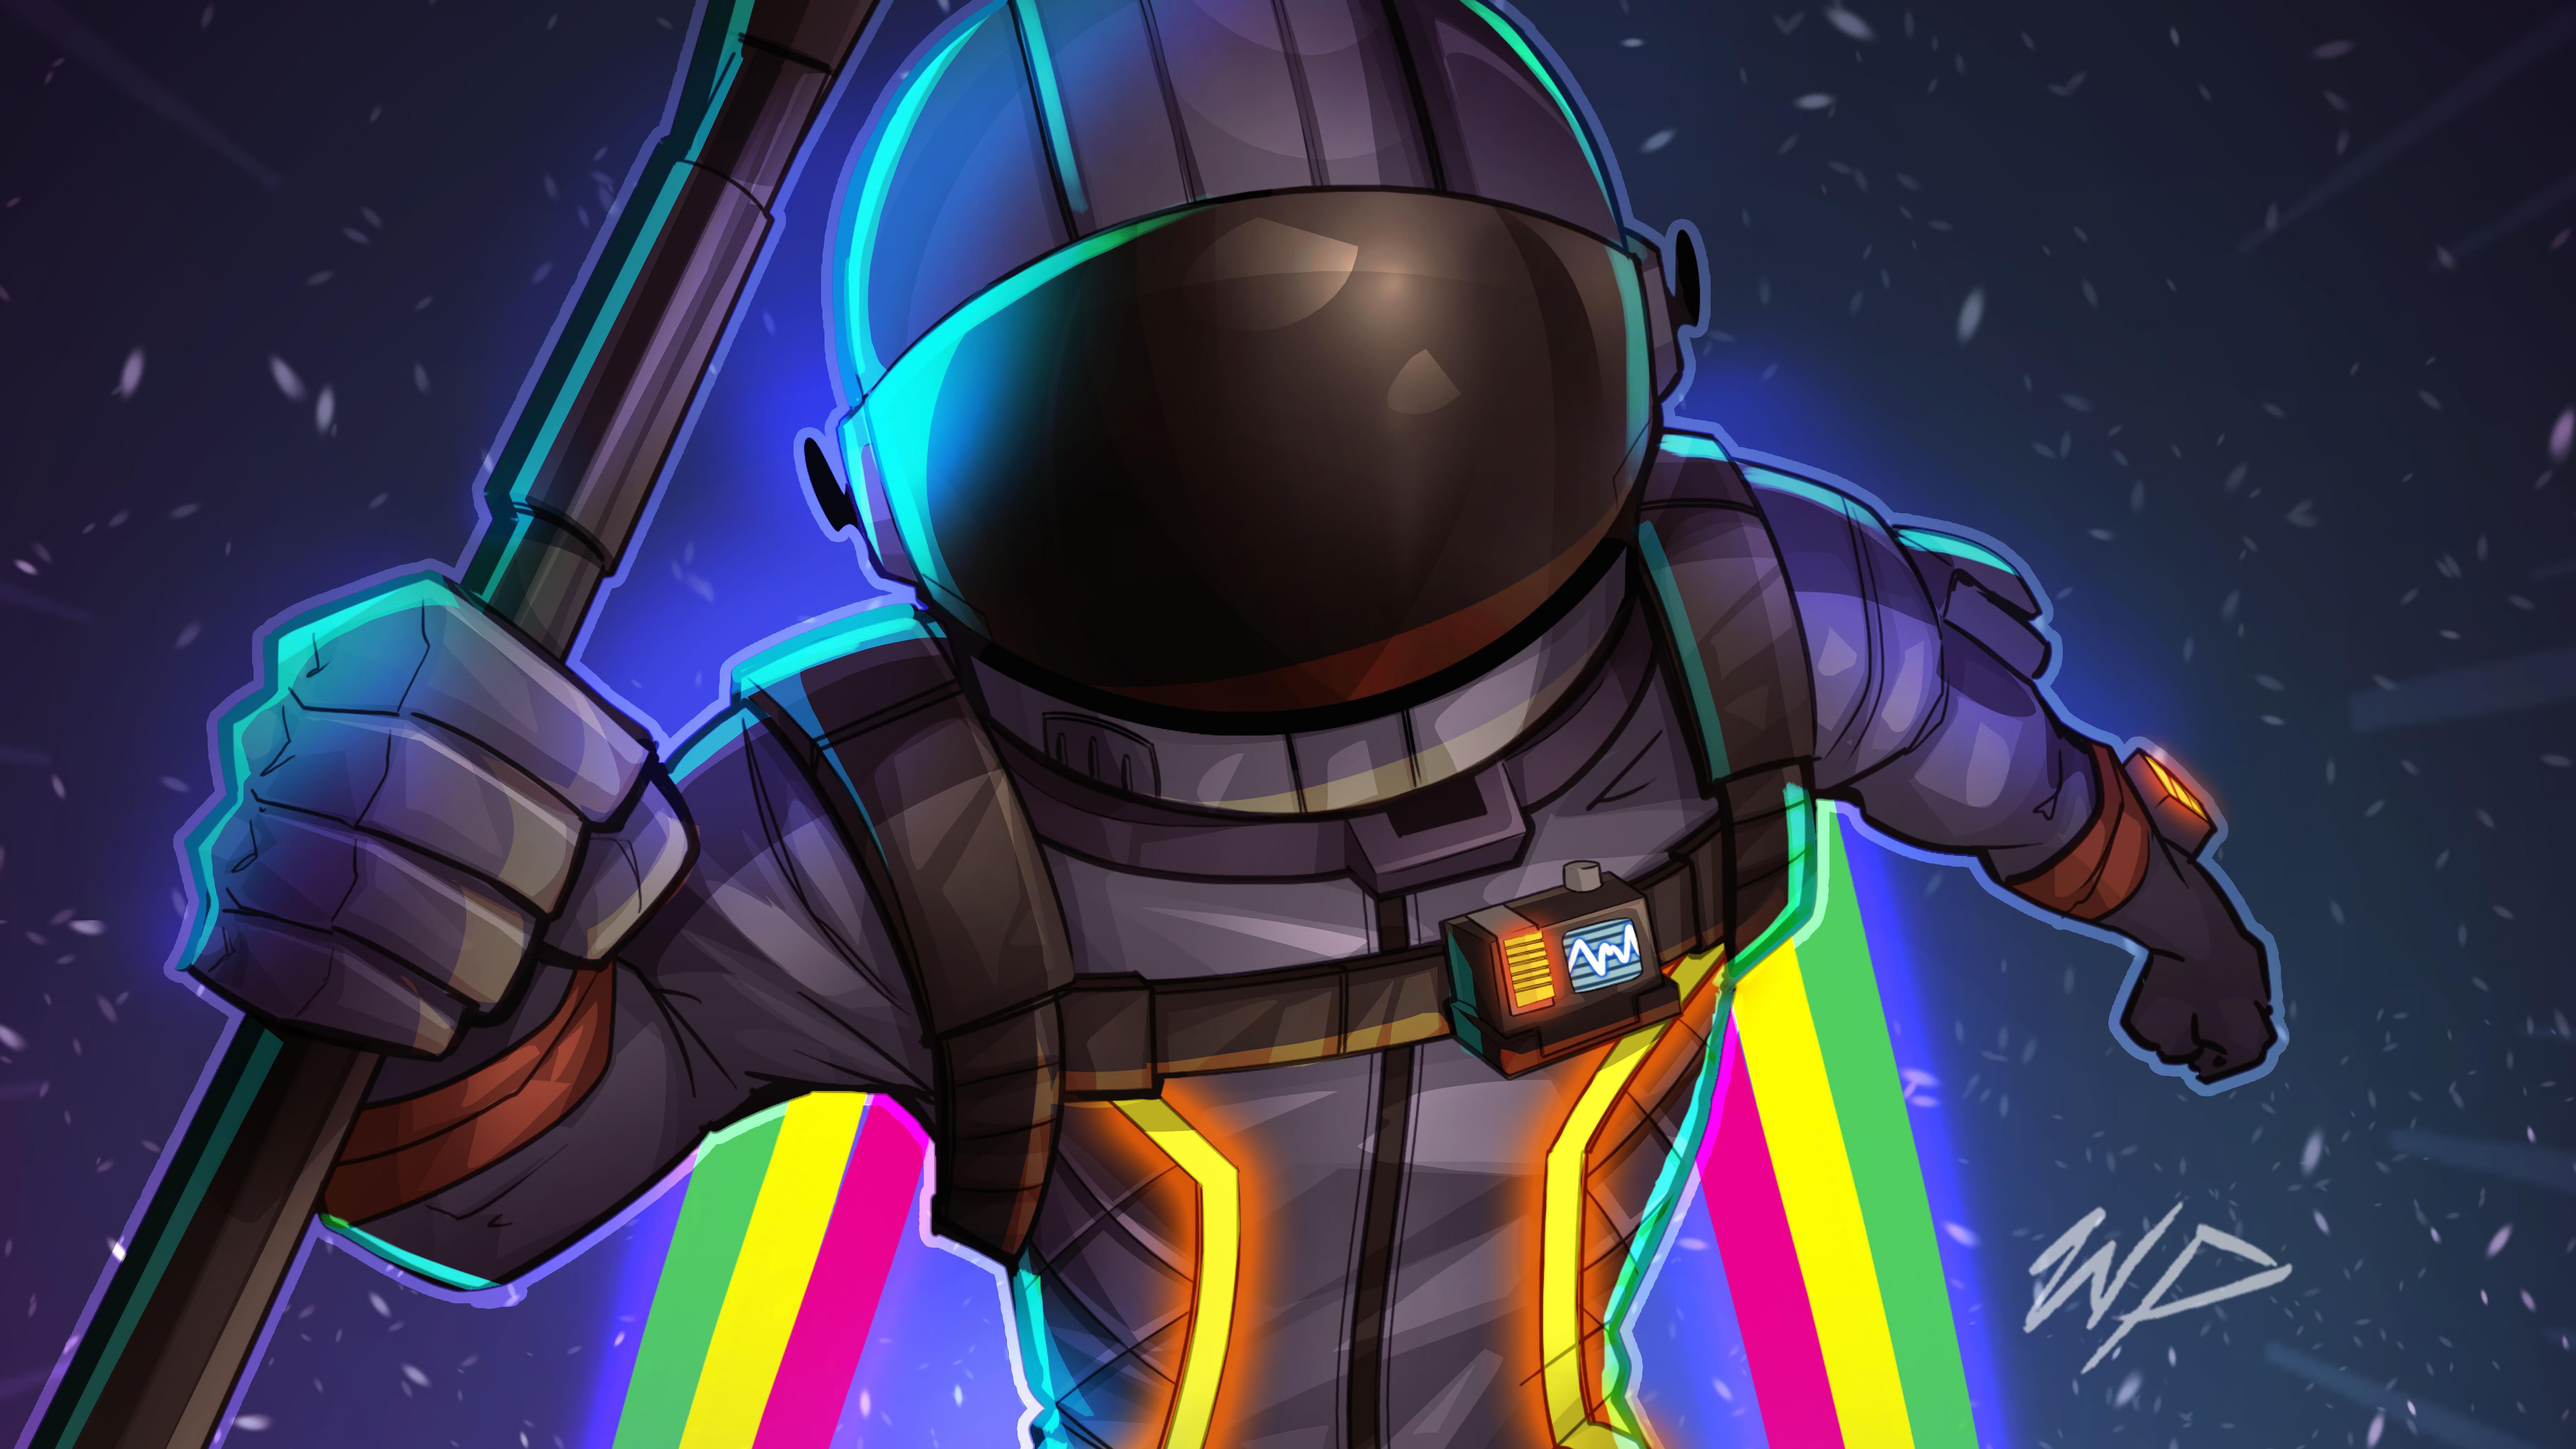 Fortnite background 12